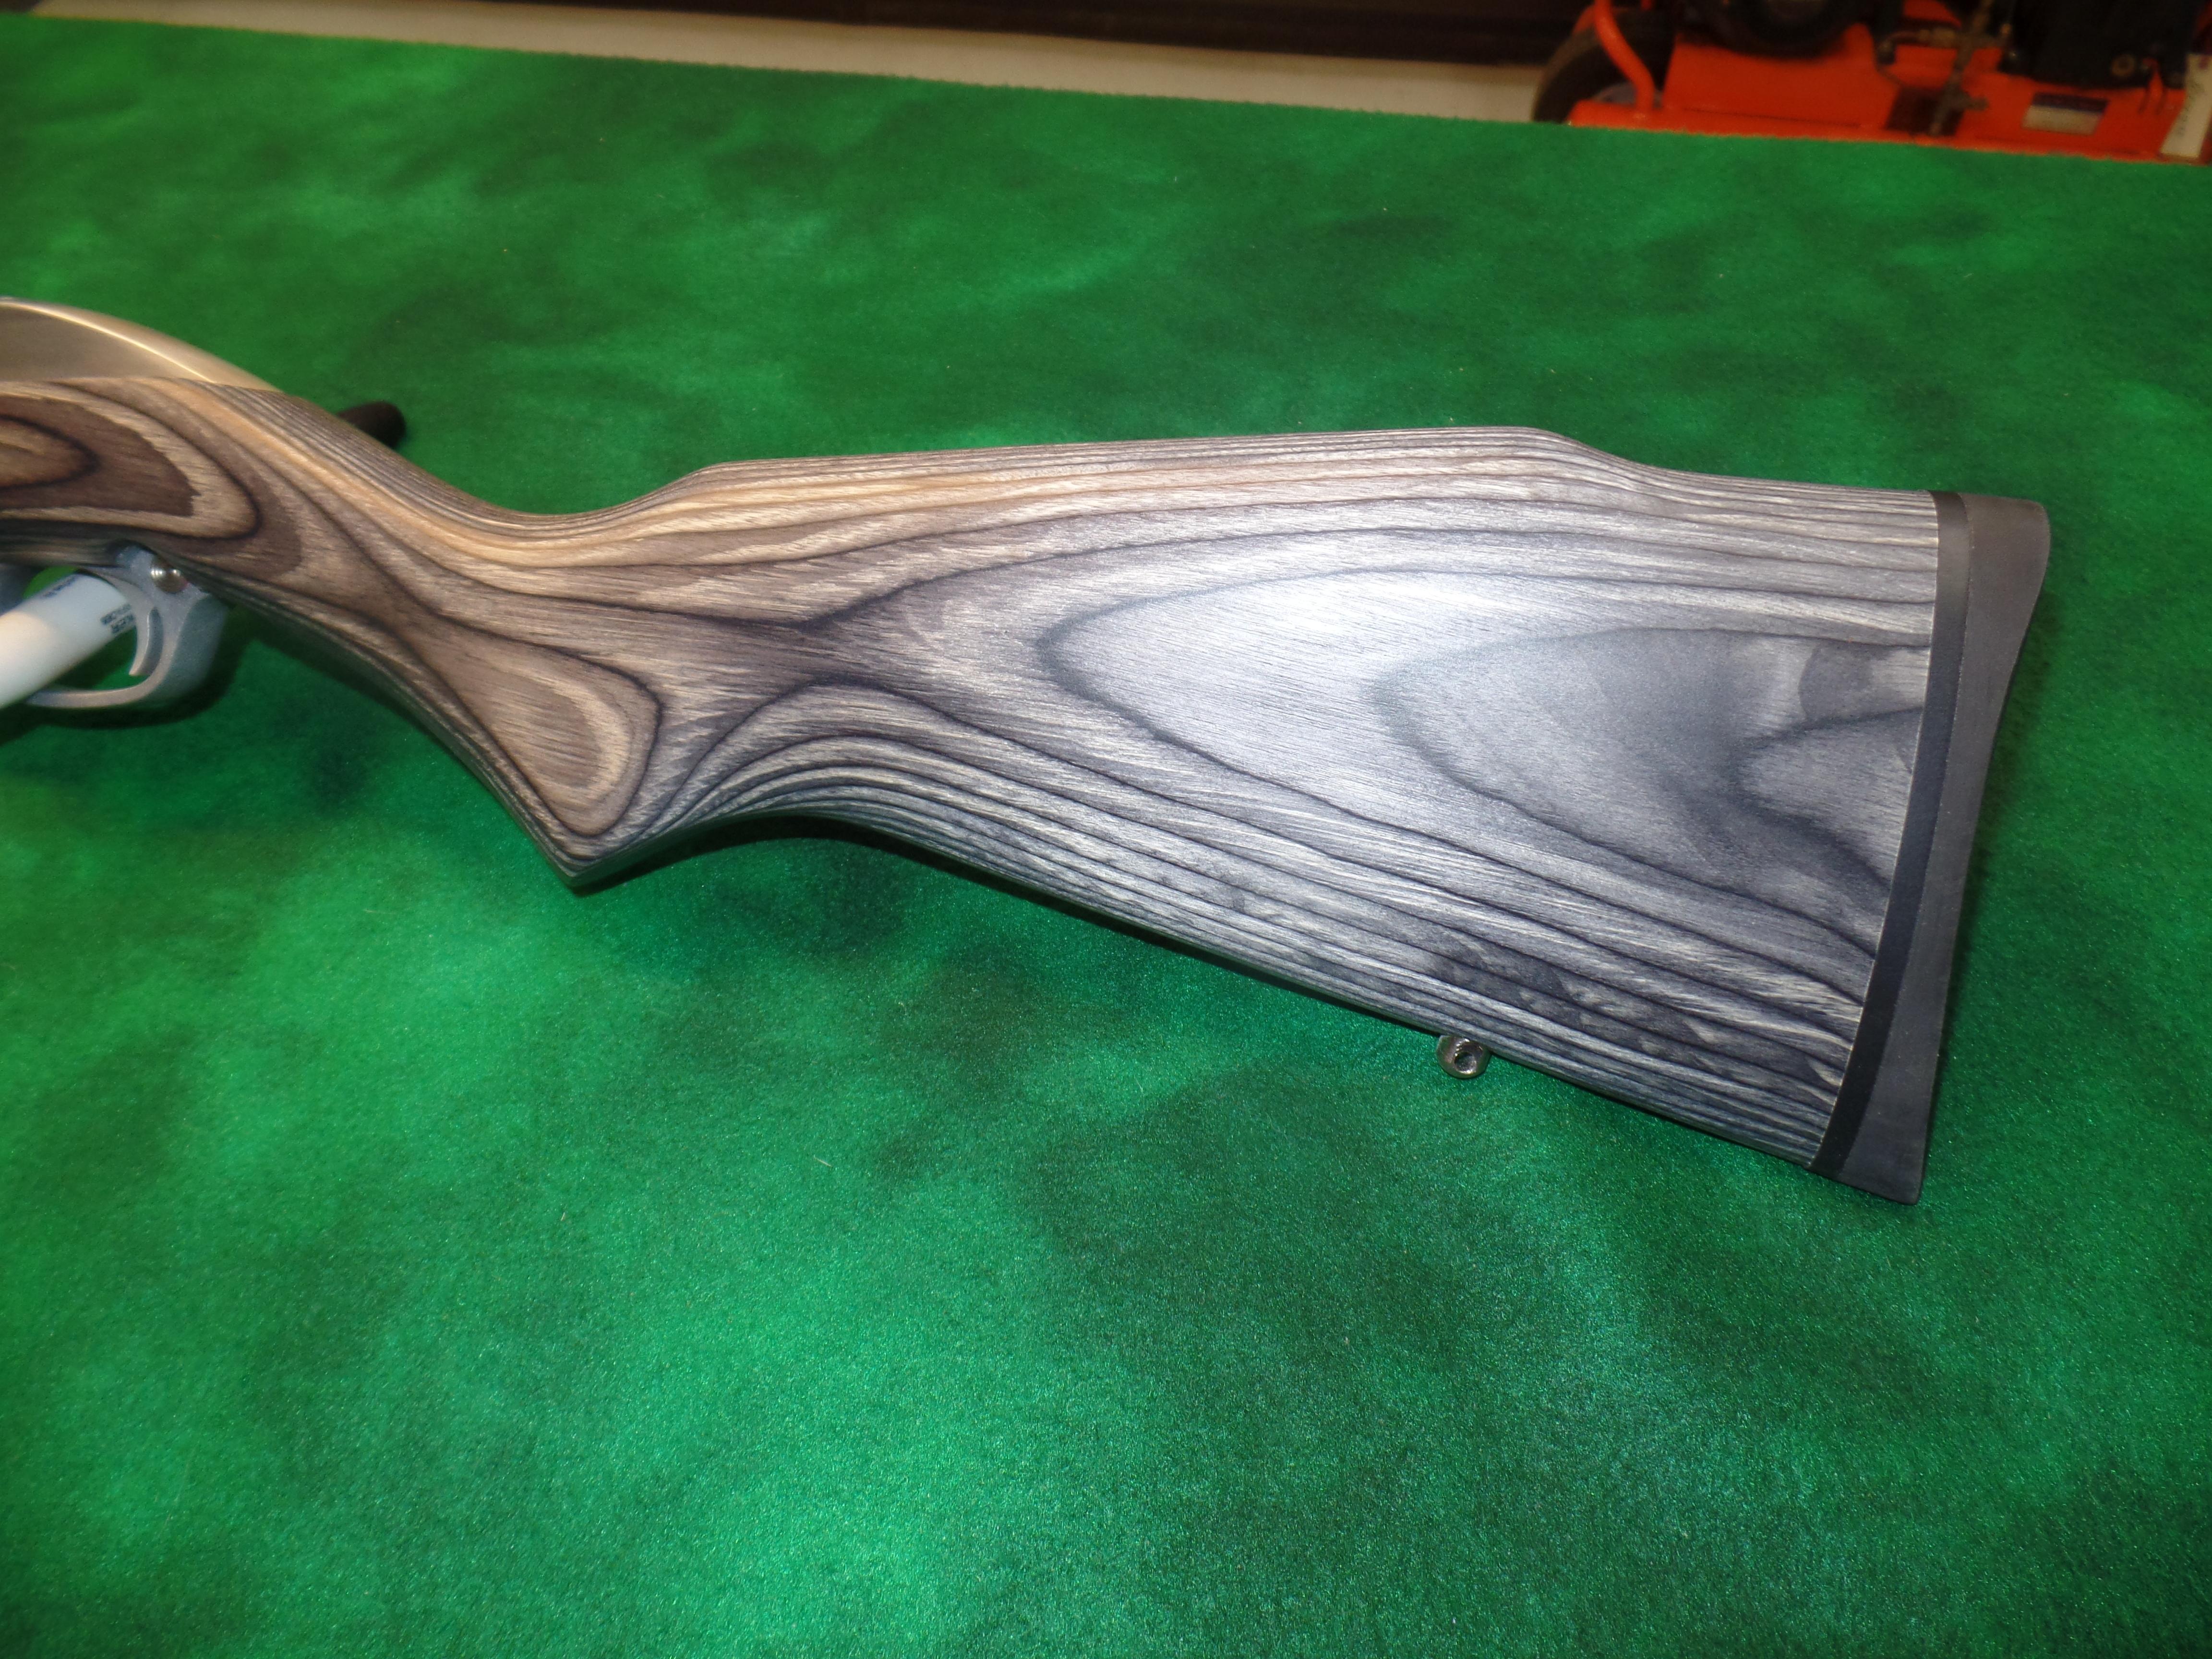 NIB Marlin 60 Stainless Steel .22LR-img-7